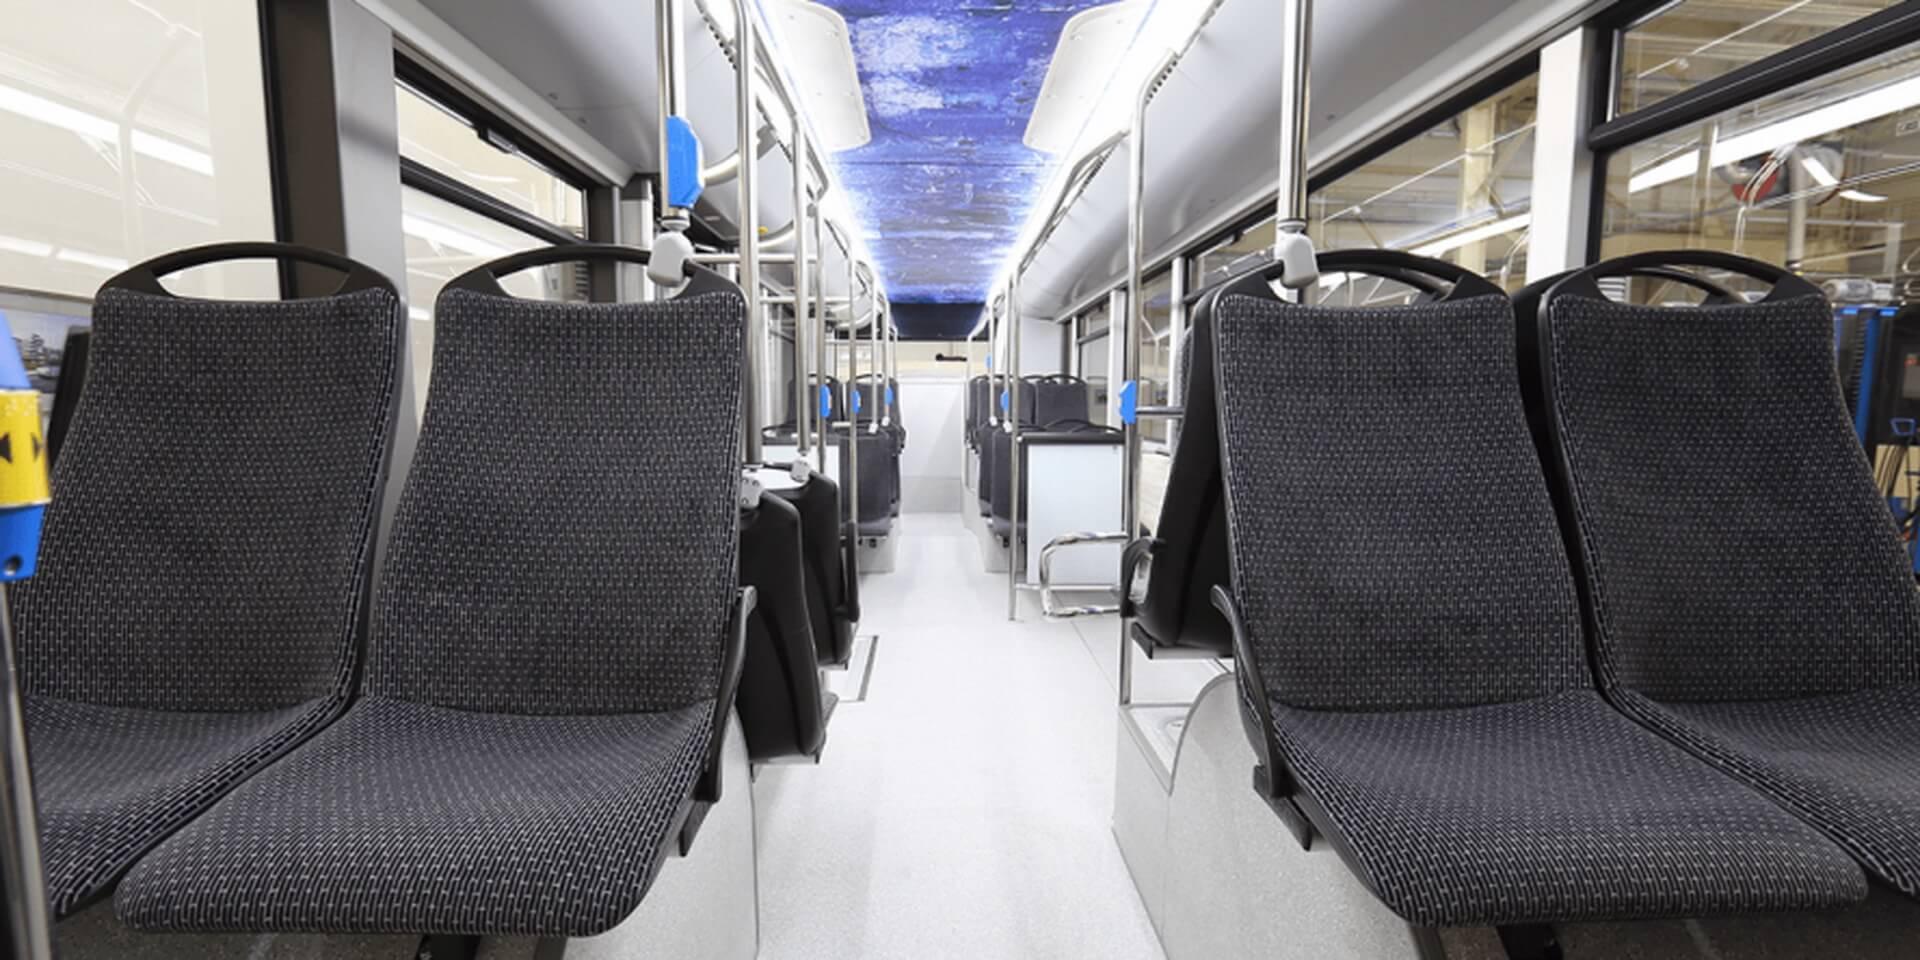 Салон электрического автобуса Solaris Urbino 12